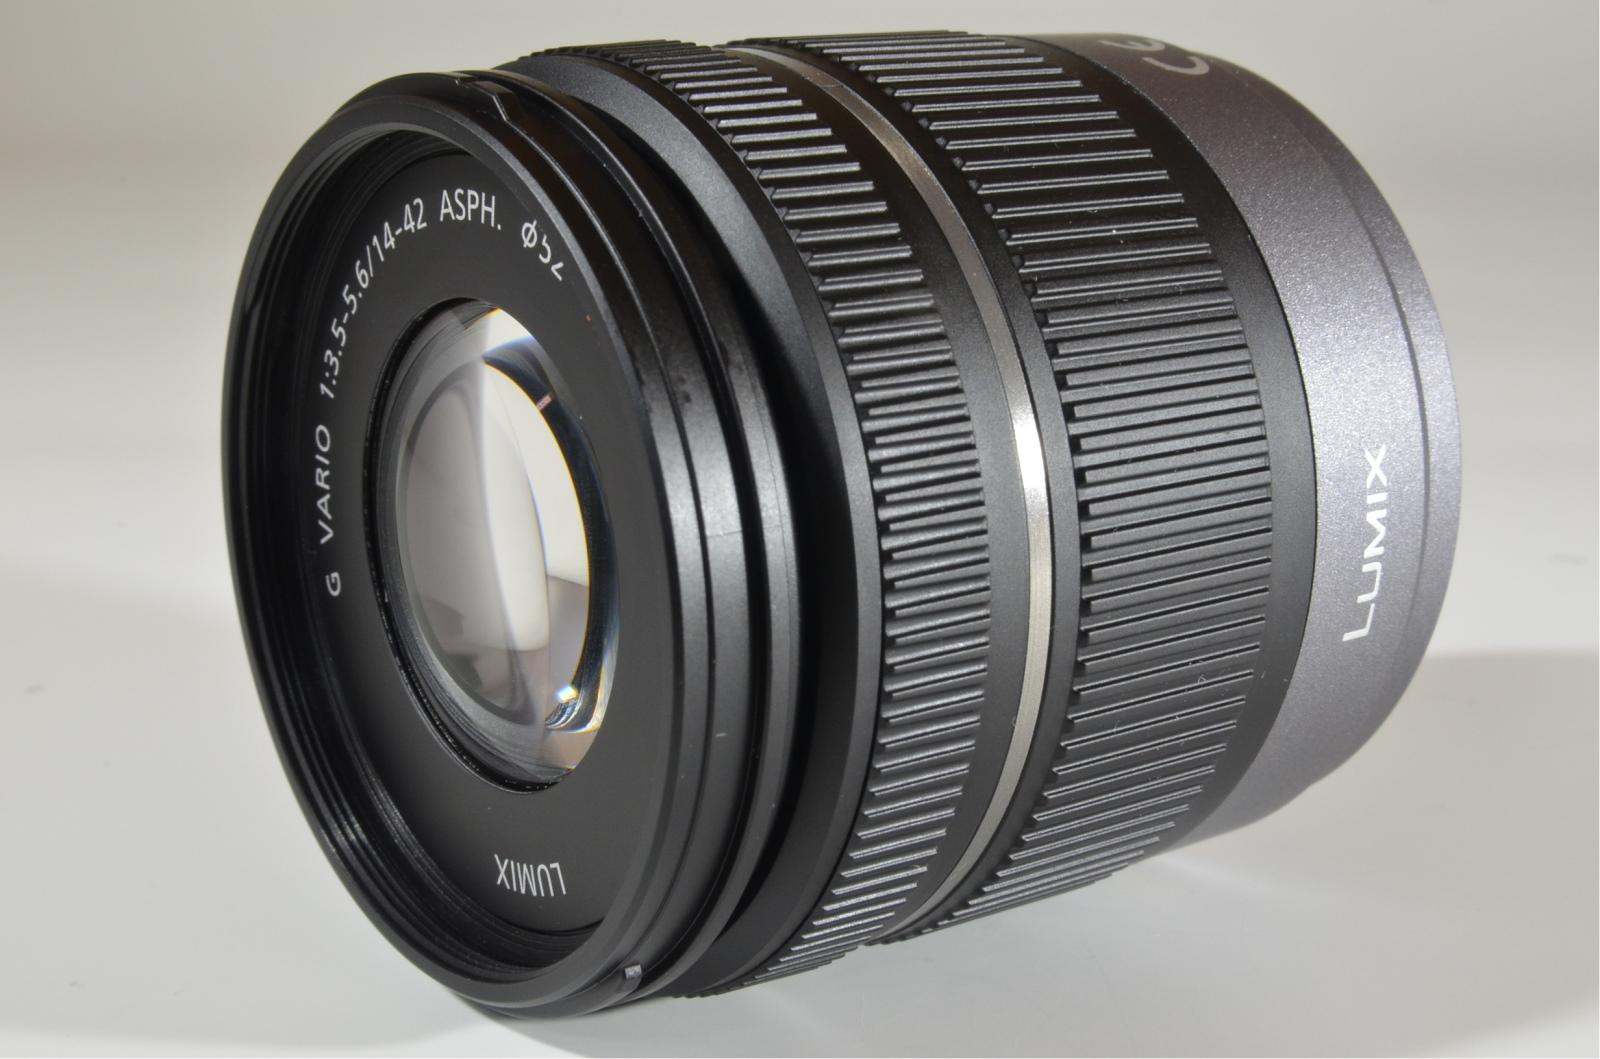 panasonic lumix g vario 14-42mm f3.5-5.6 asph mega ois